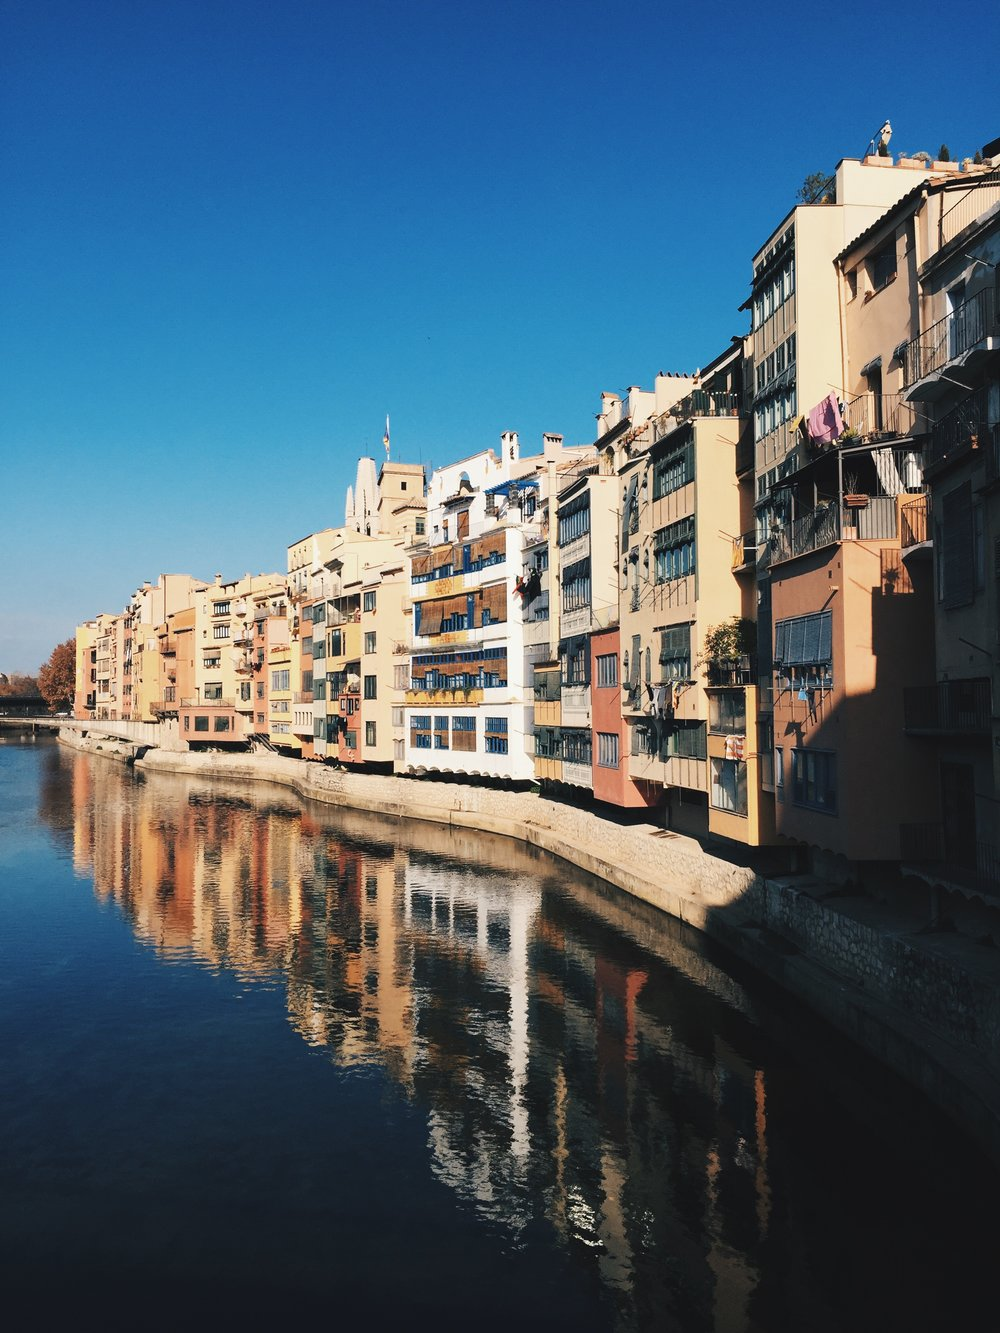 The postcard view of Girona